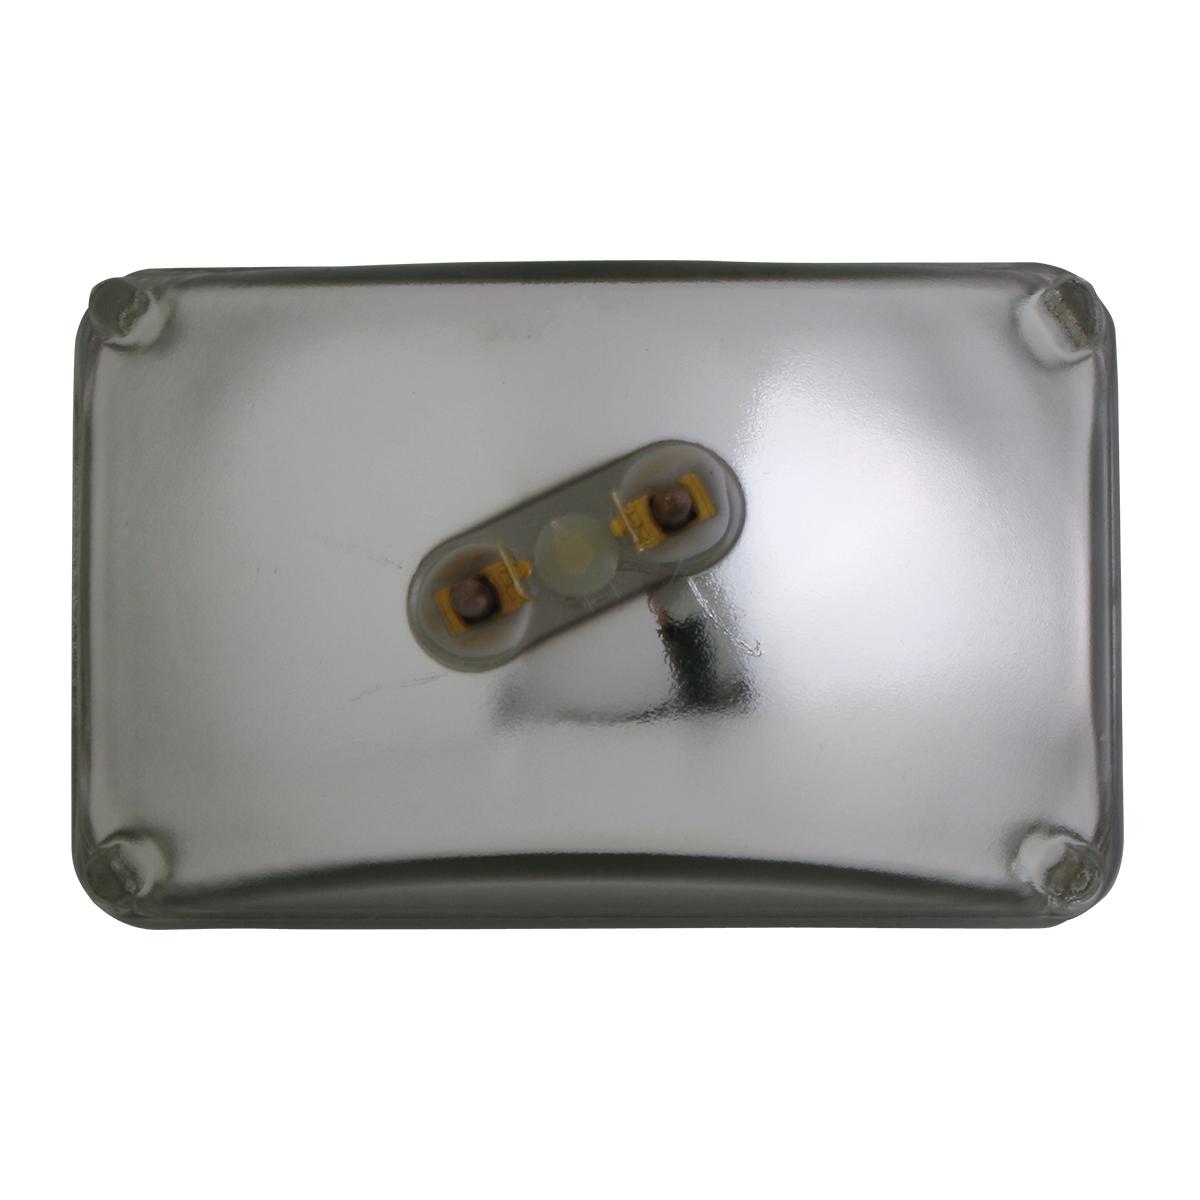 #80428 Rectangular Sealed Beam #H4651 Headlight - Back View